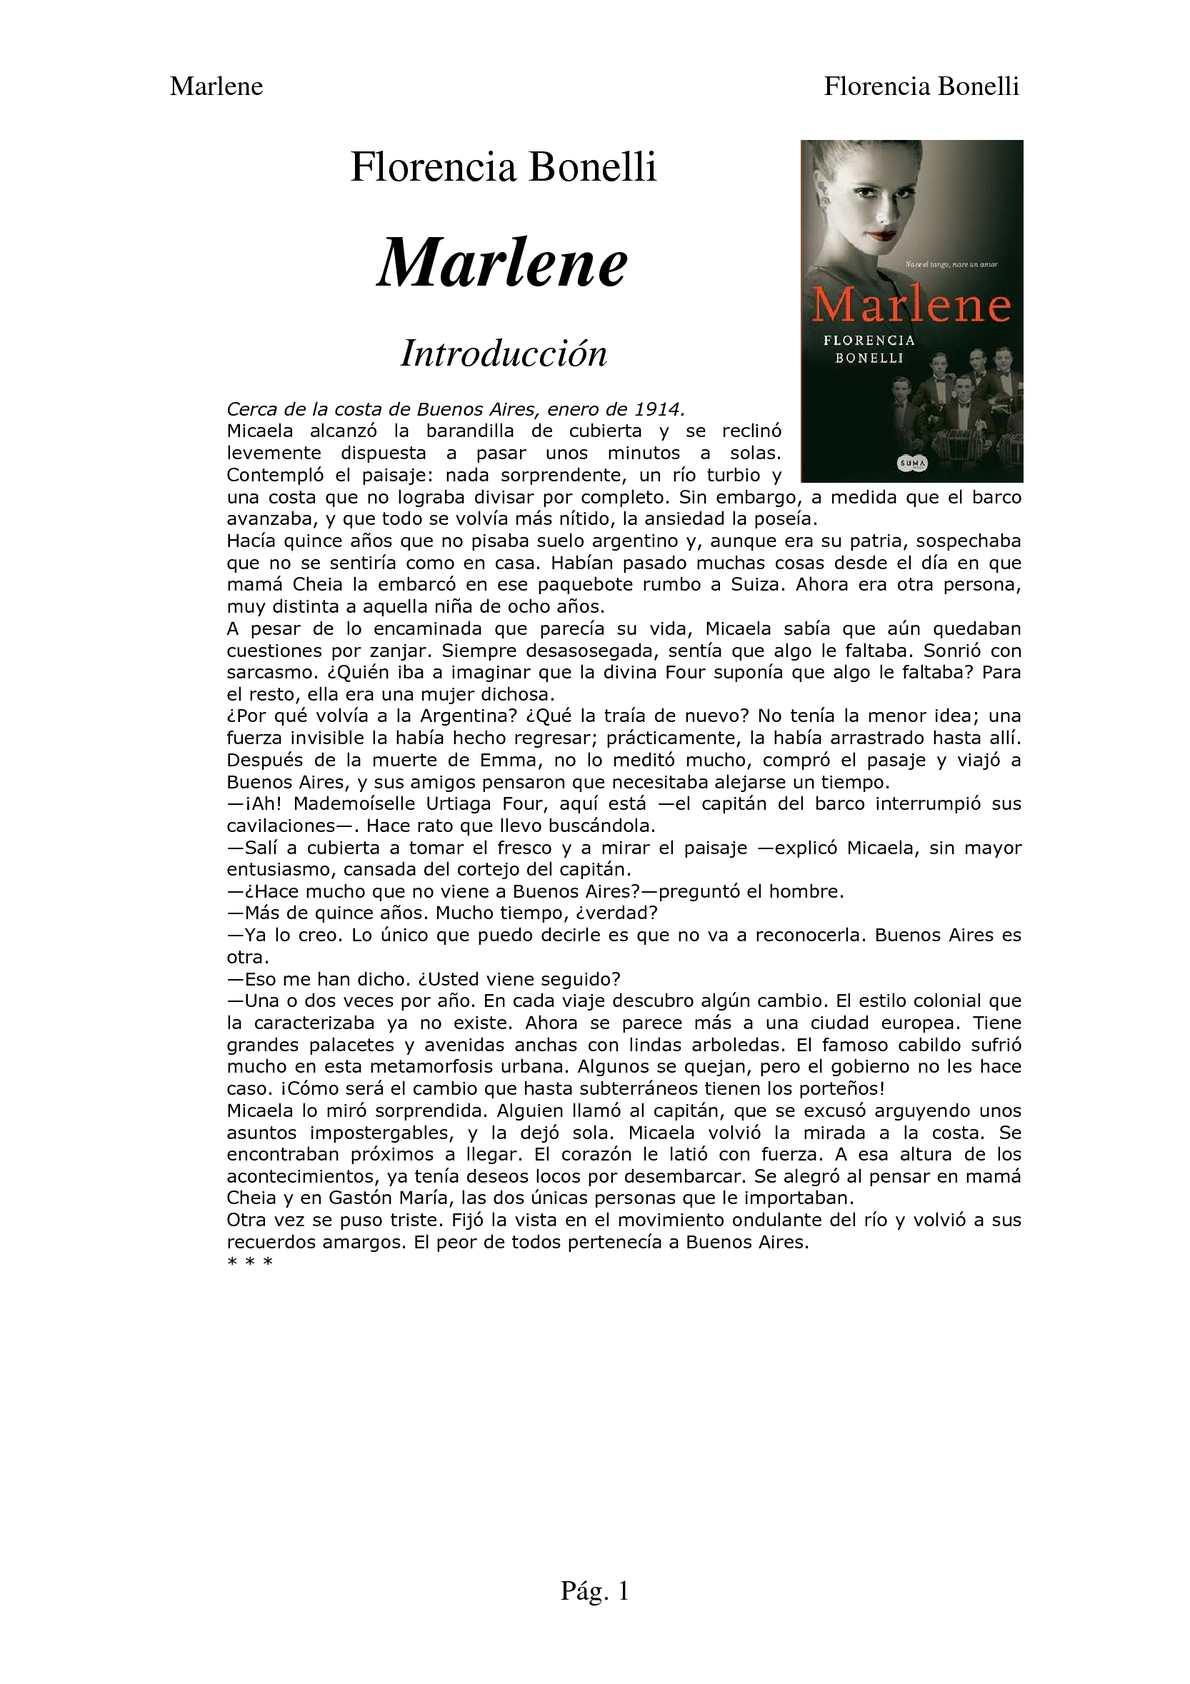 06bb7d3e144b5 Calaméo - bonelli florencia - marlene